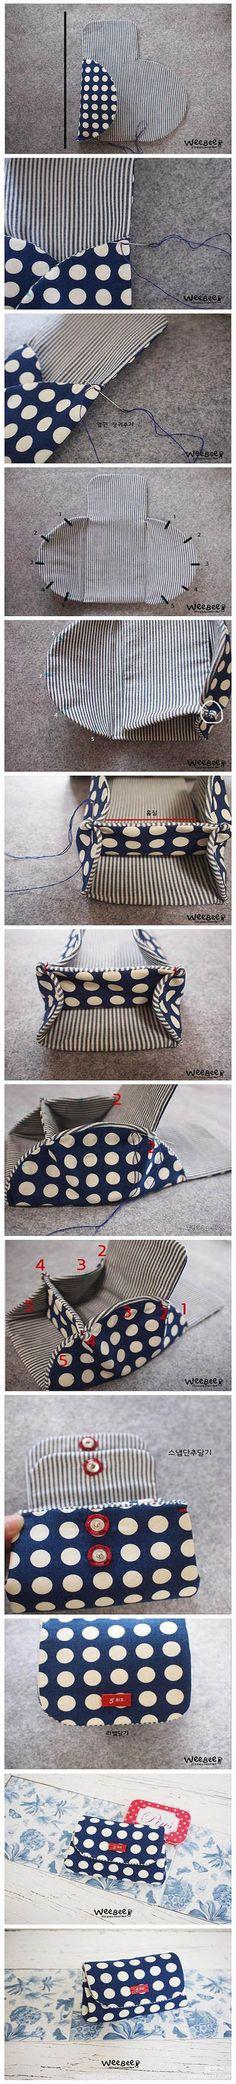 Diy Beautiful Handbag | DIY & Crafts Tutorials